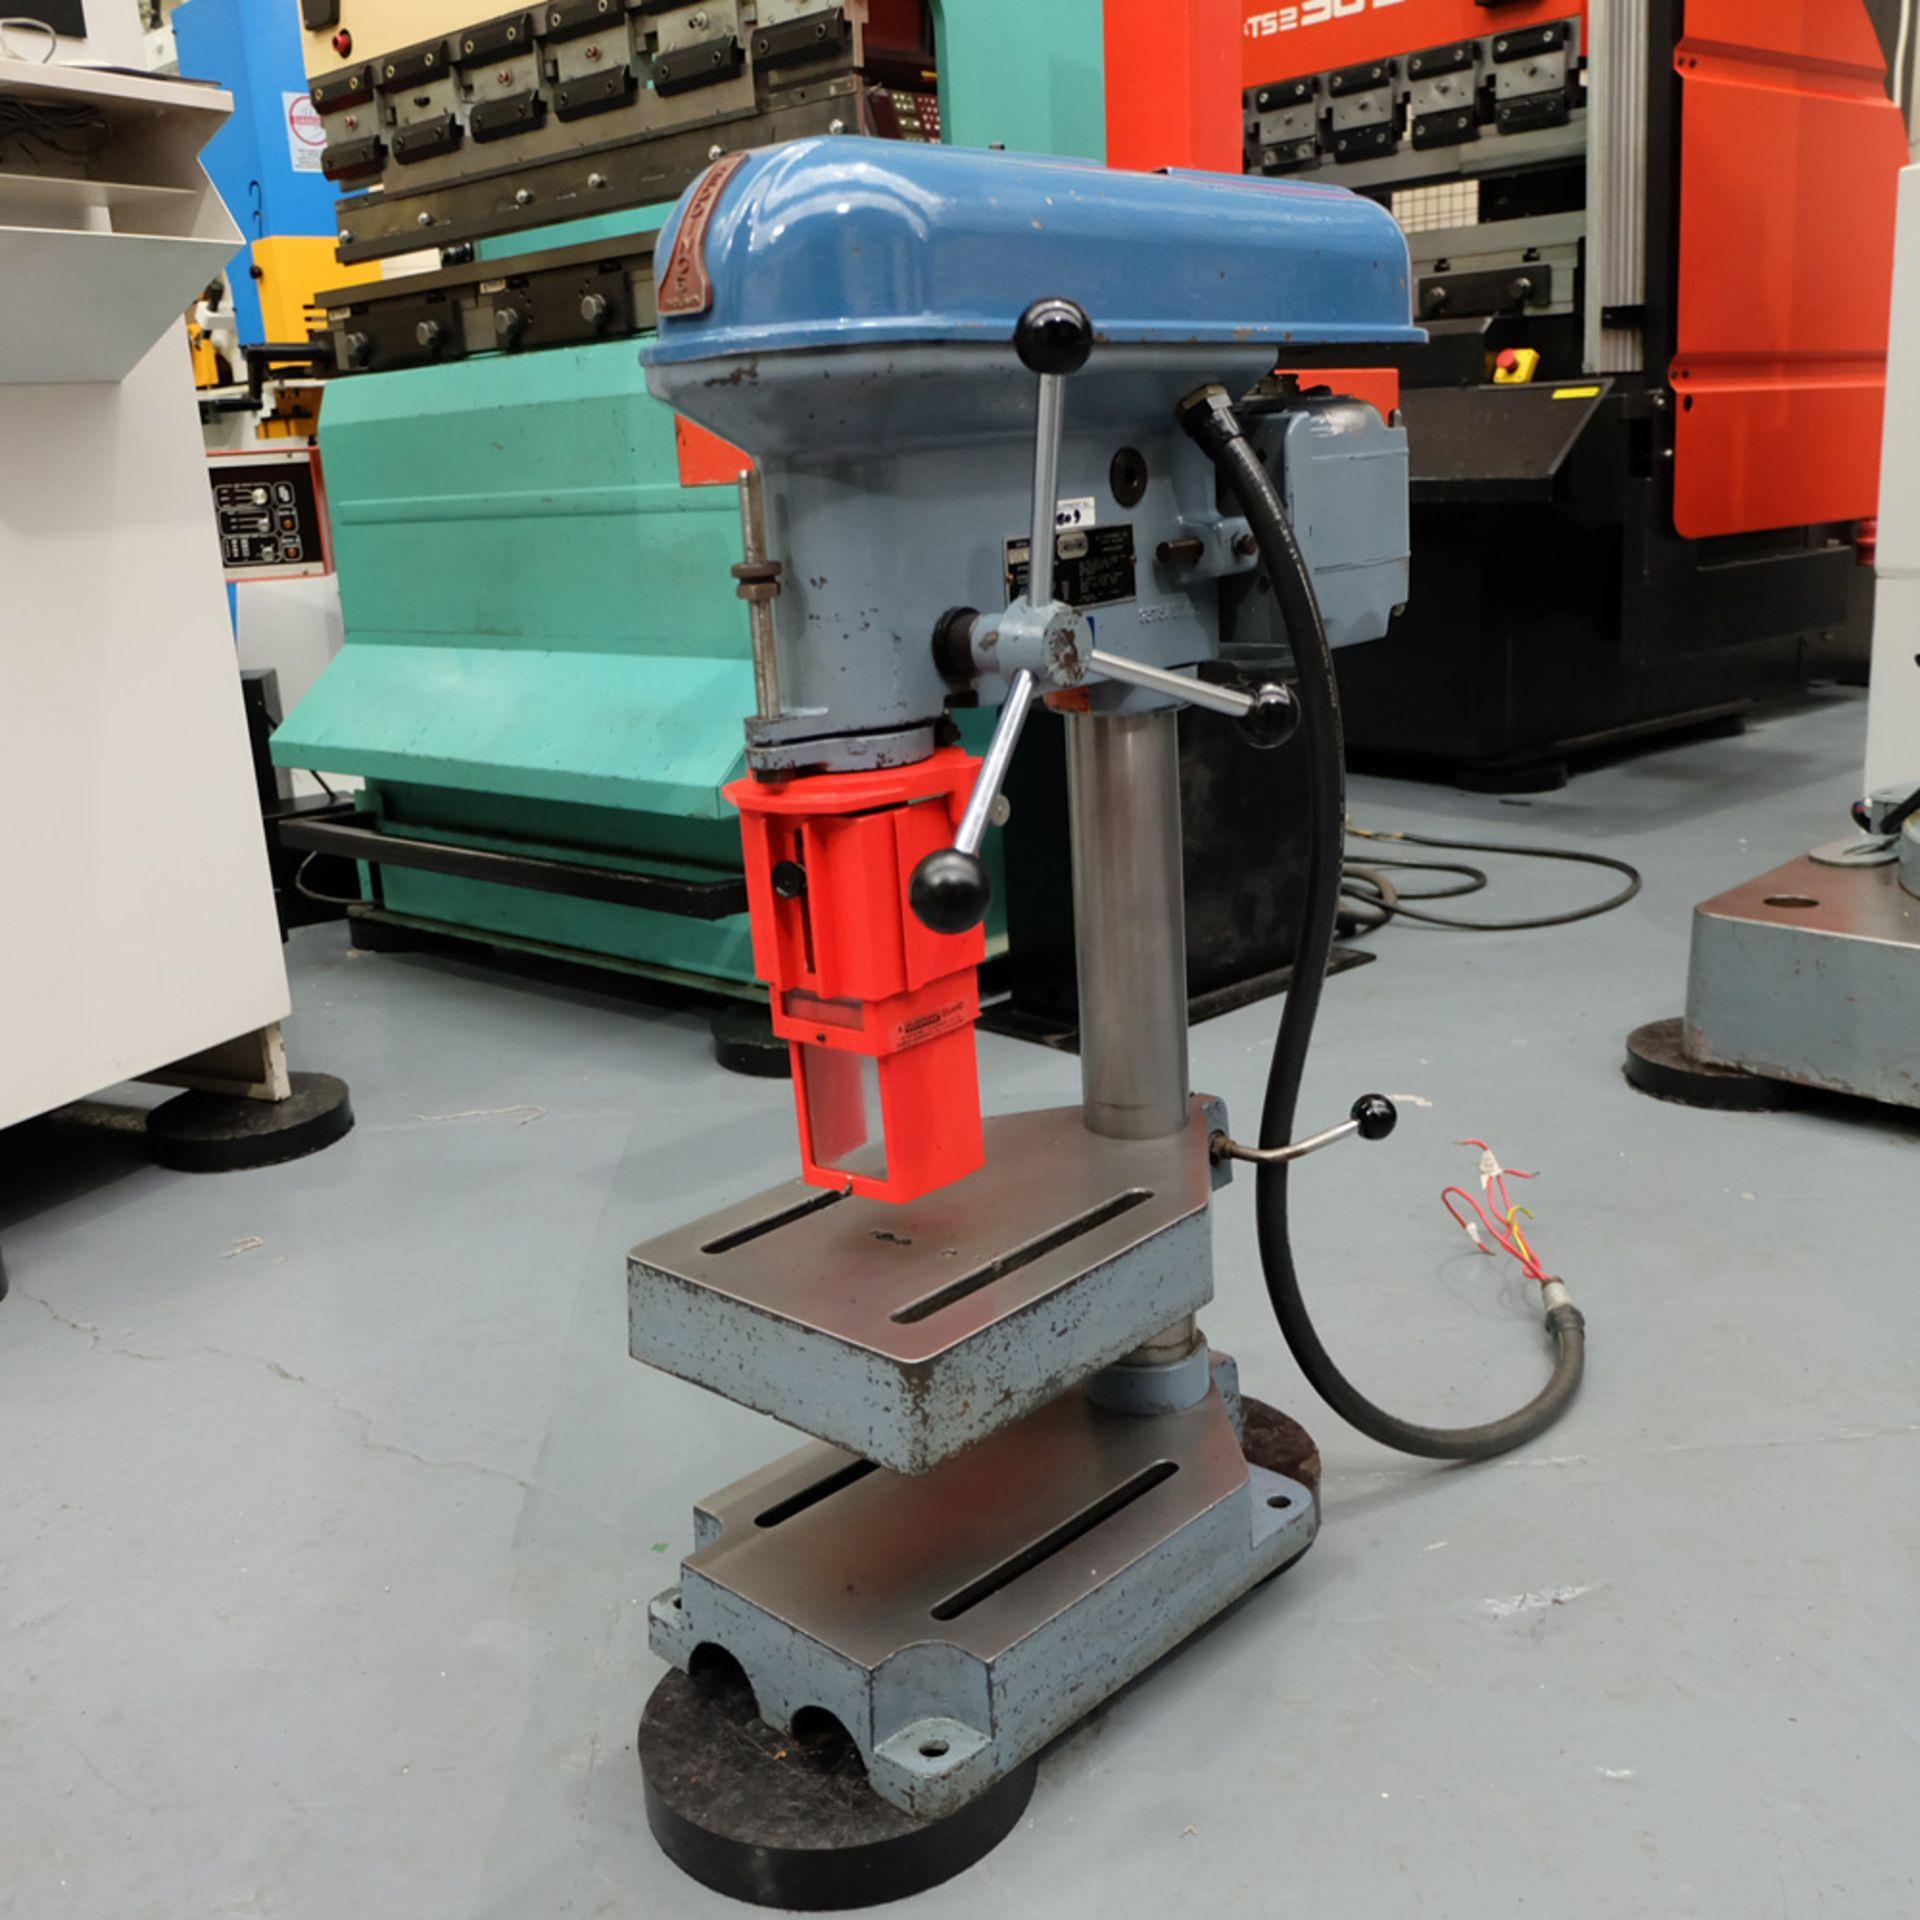 "Meddings Drilltru DTF Bench Drill. Capacity 1/2"". Table Size 9"" x 11""."